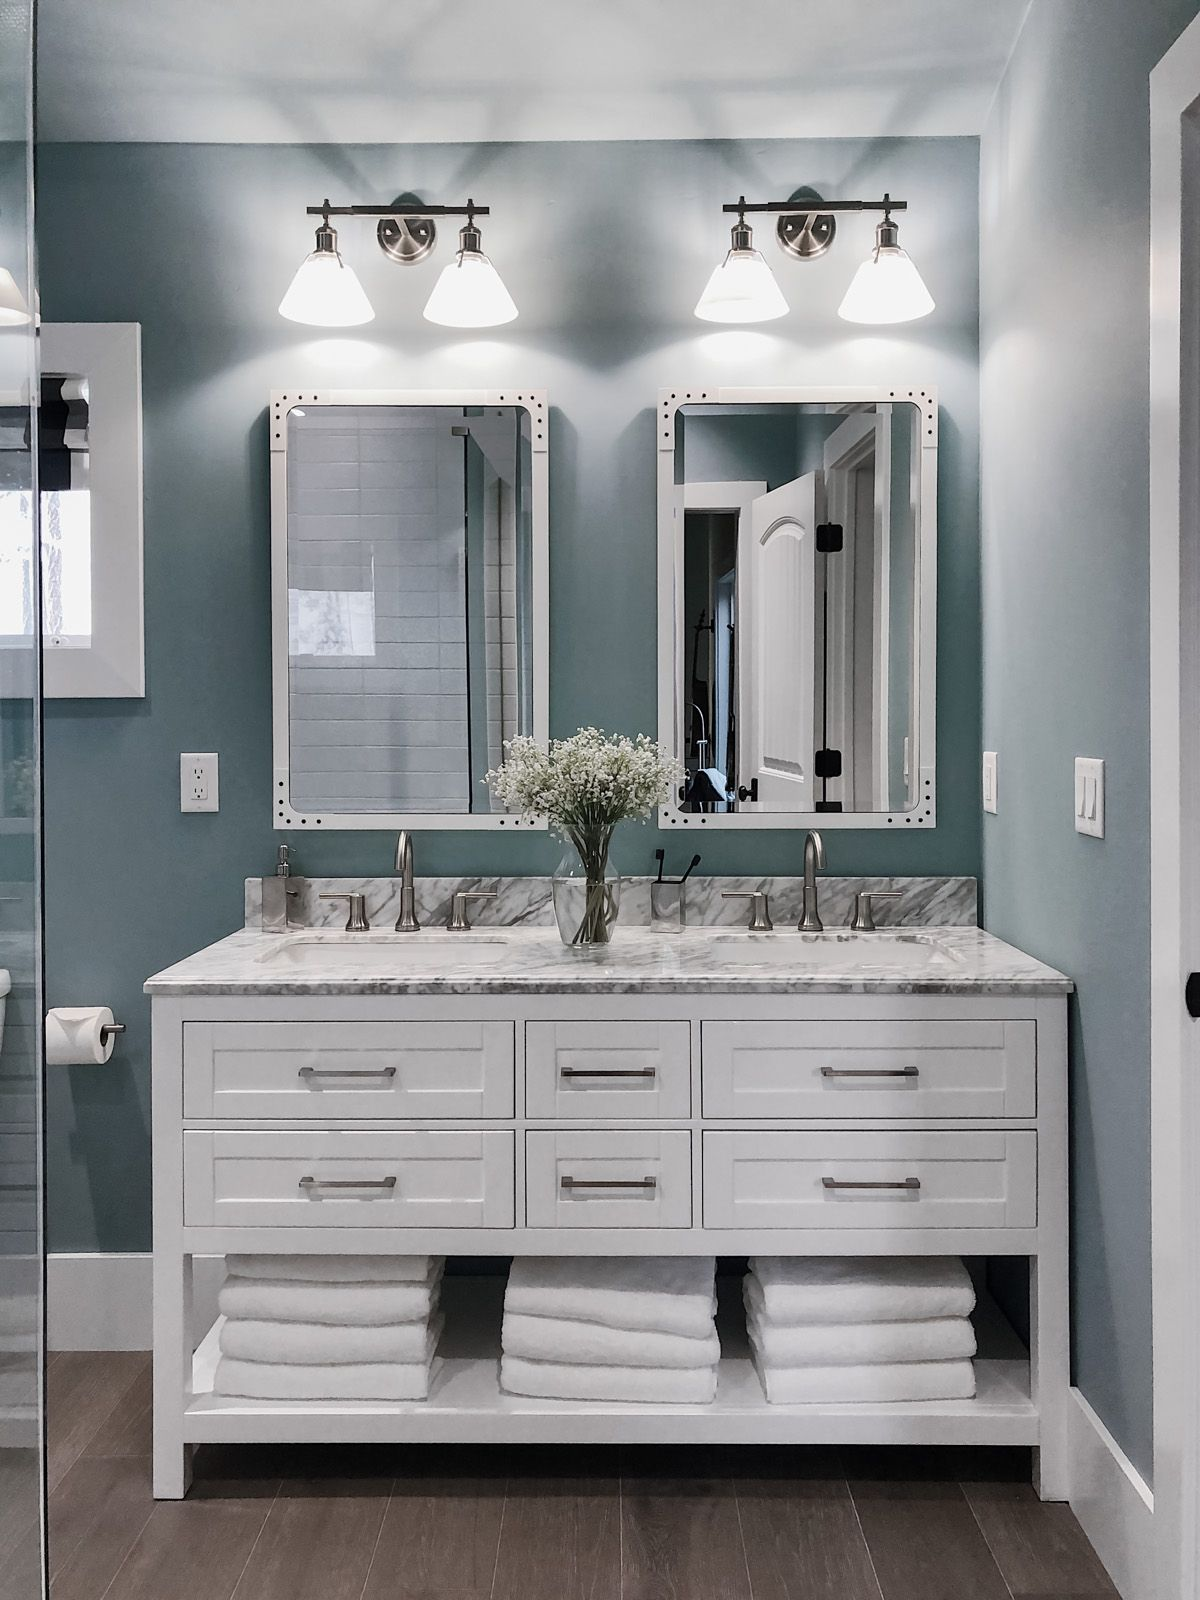 2019 Hgtv Dream Home Tour Homey Oh My Dream Bathrooms Hgtv Dream Home Small Bathroom Remodel